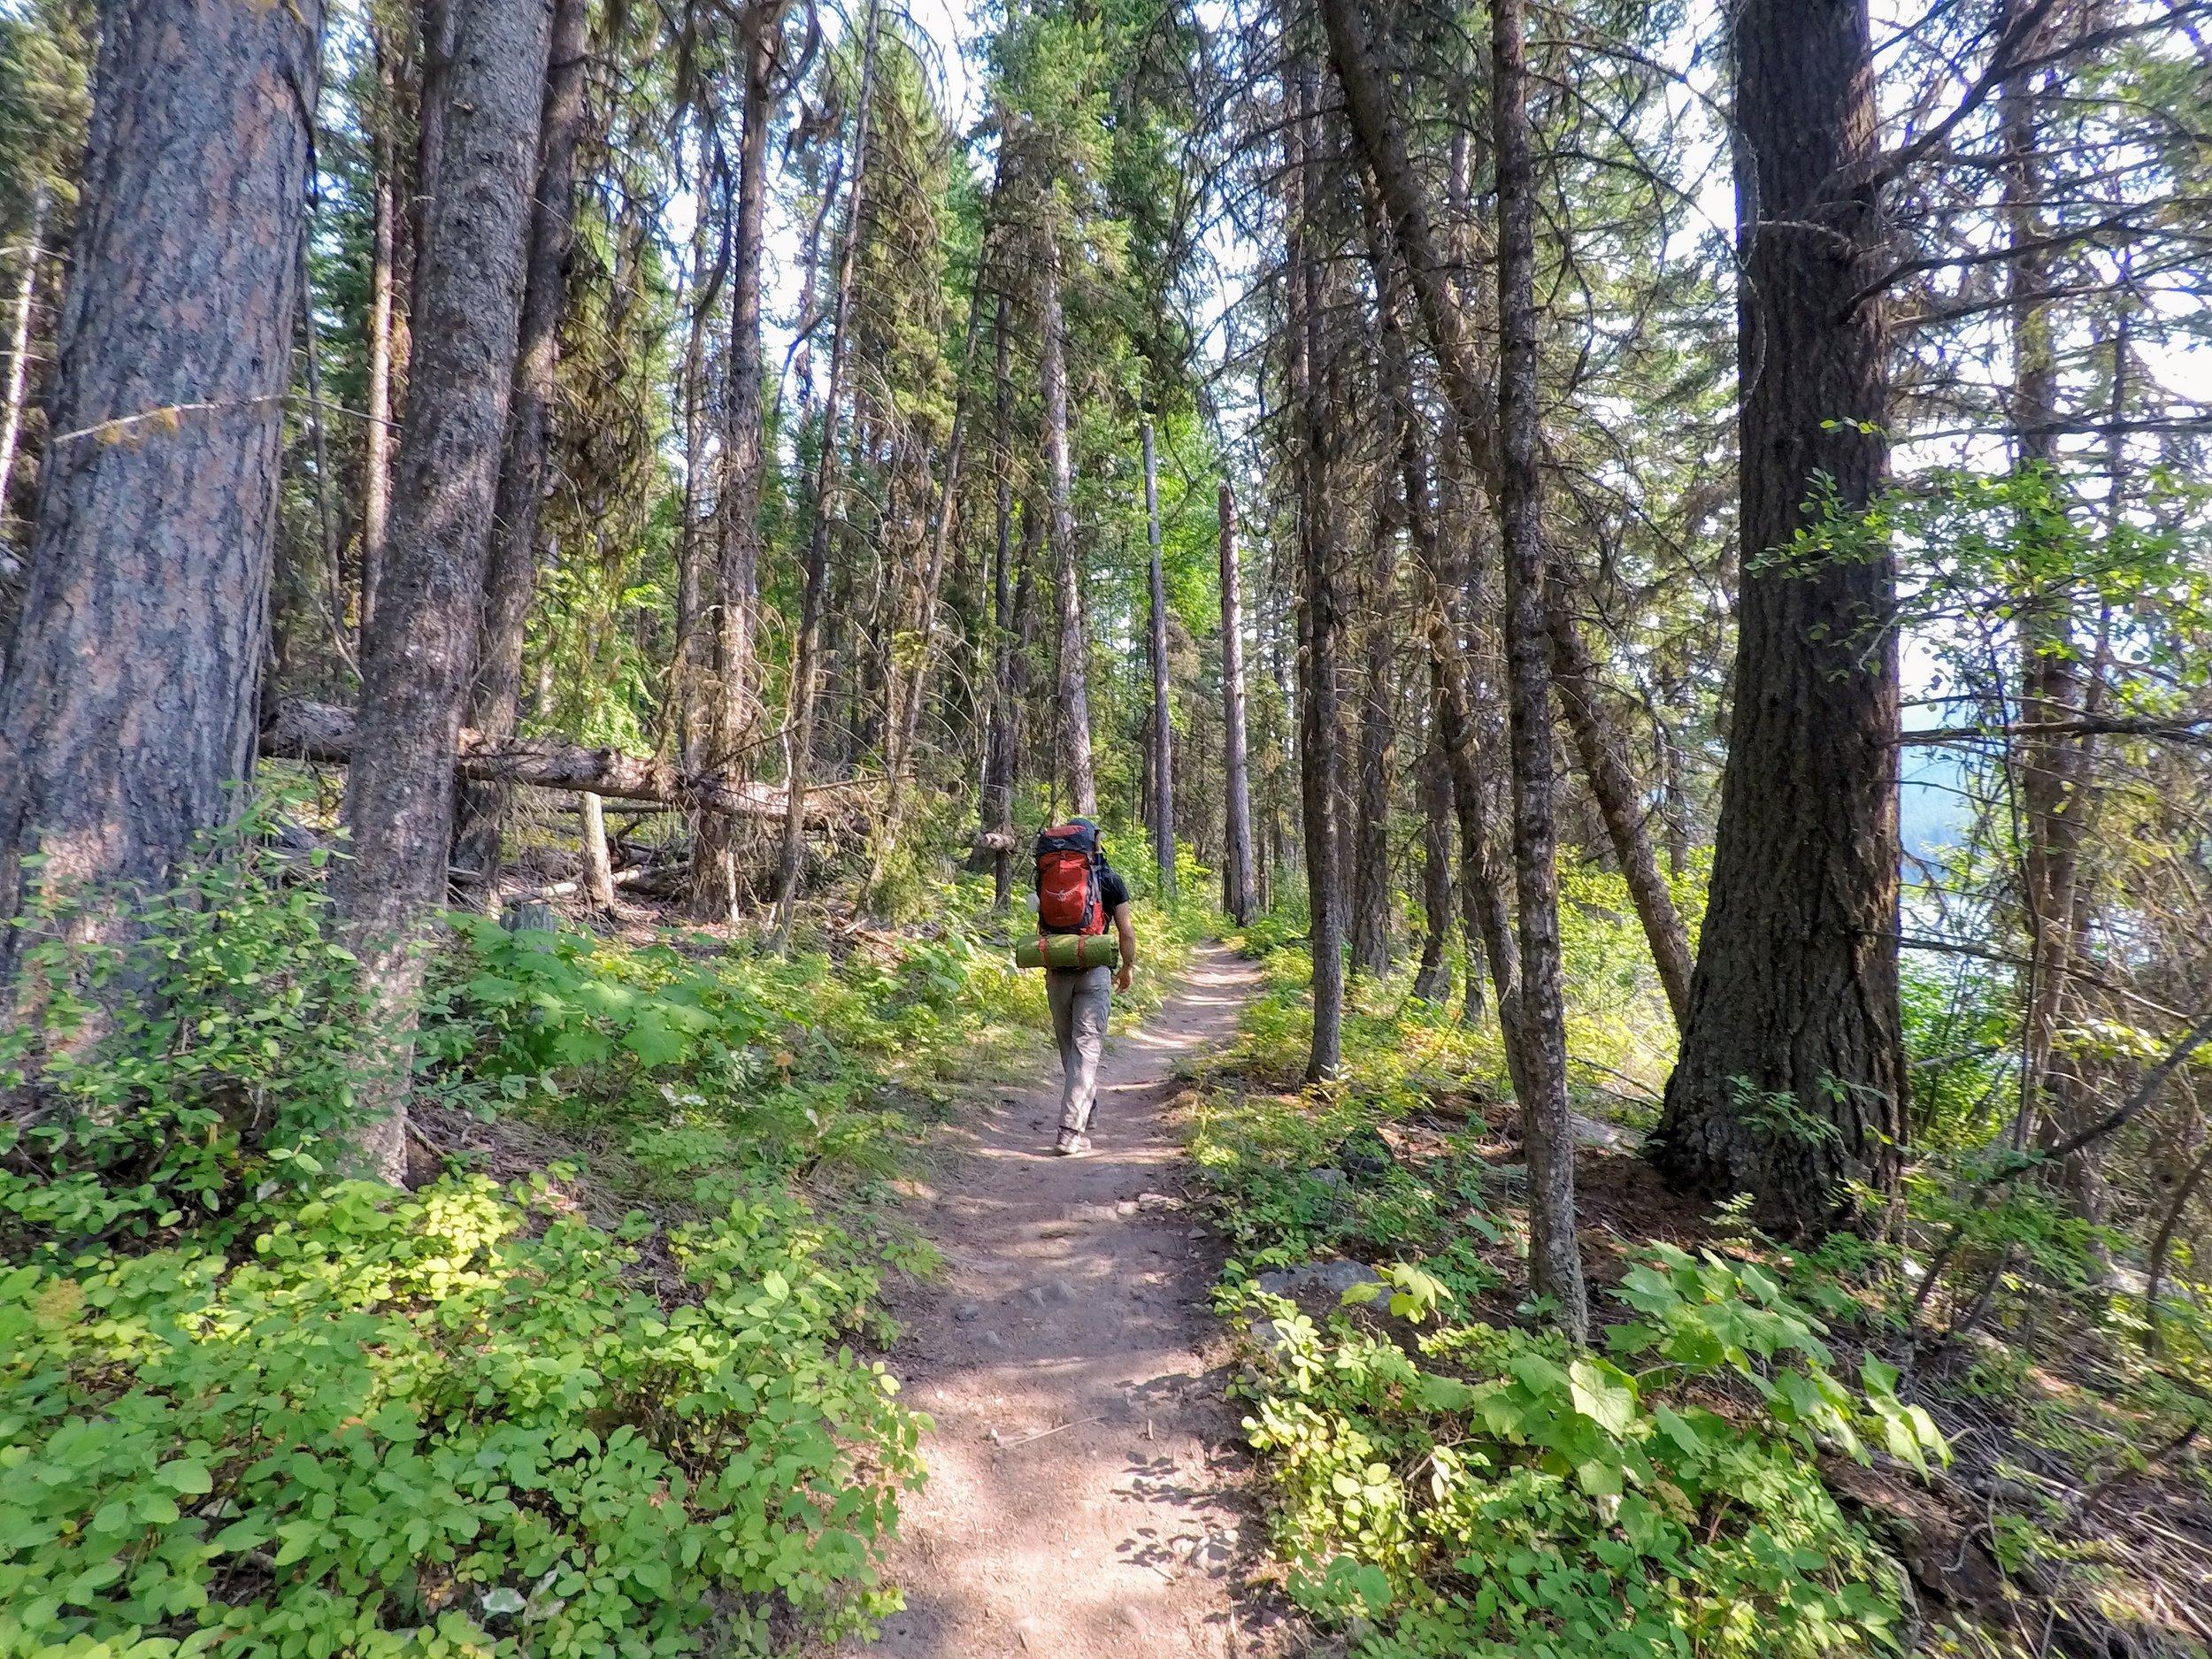 Day 1, Mile 1. Bowman Lake Trailhead to Bowman Lake Head Campground.